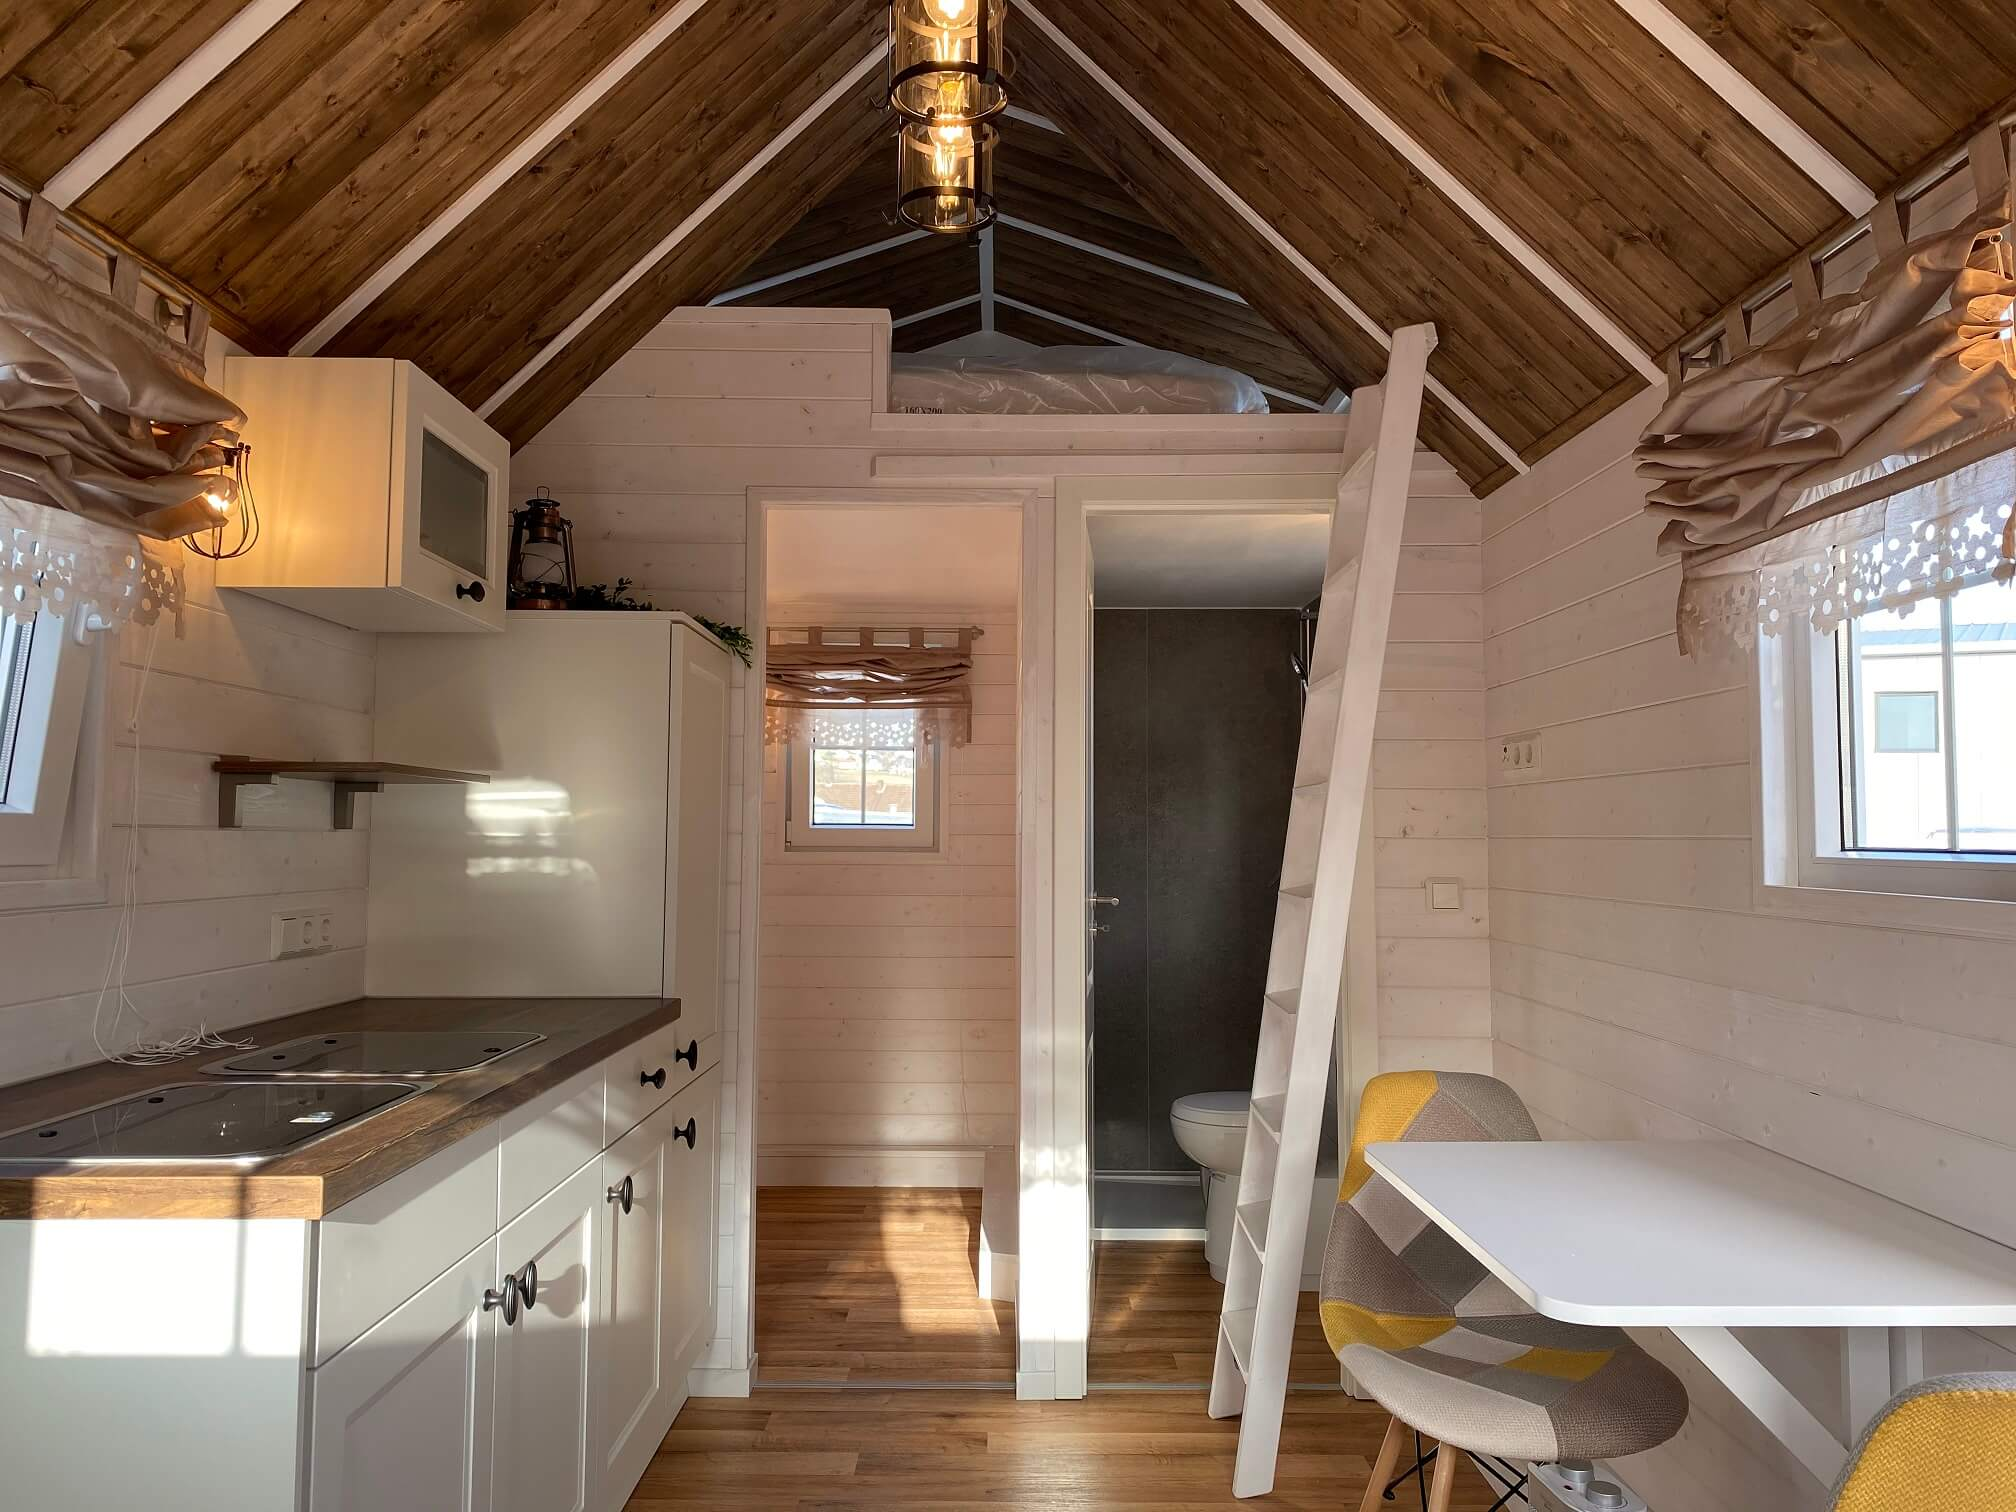 Tiny-House-Frankreich-vital-camp-gmbh12